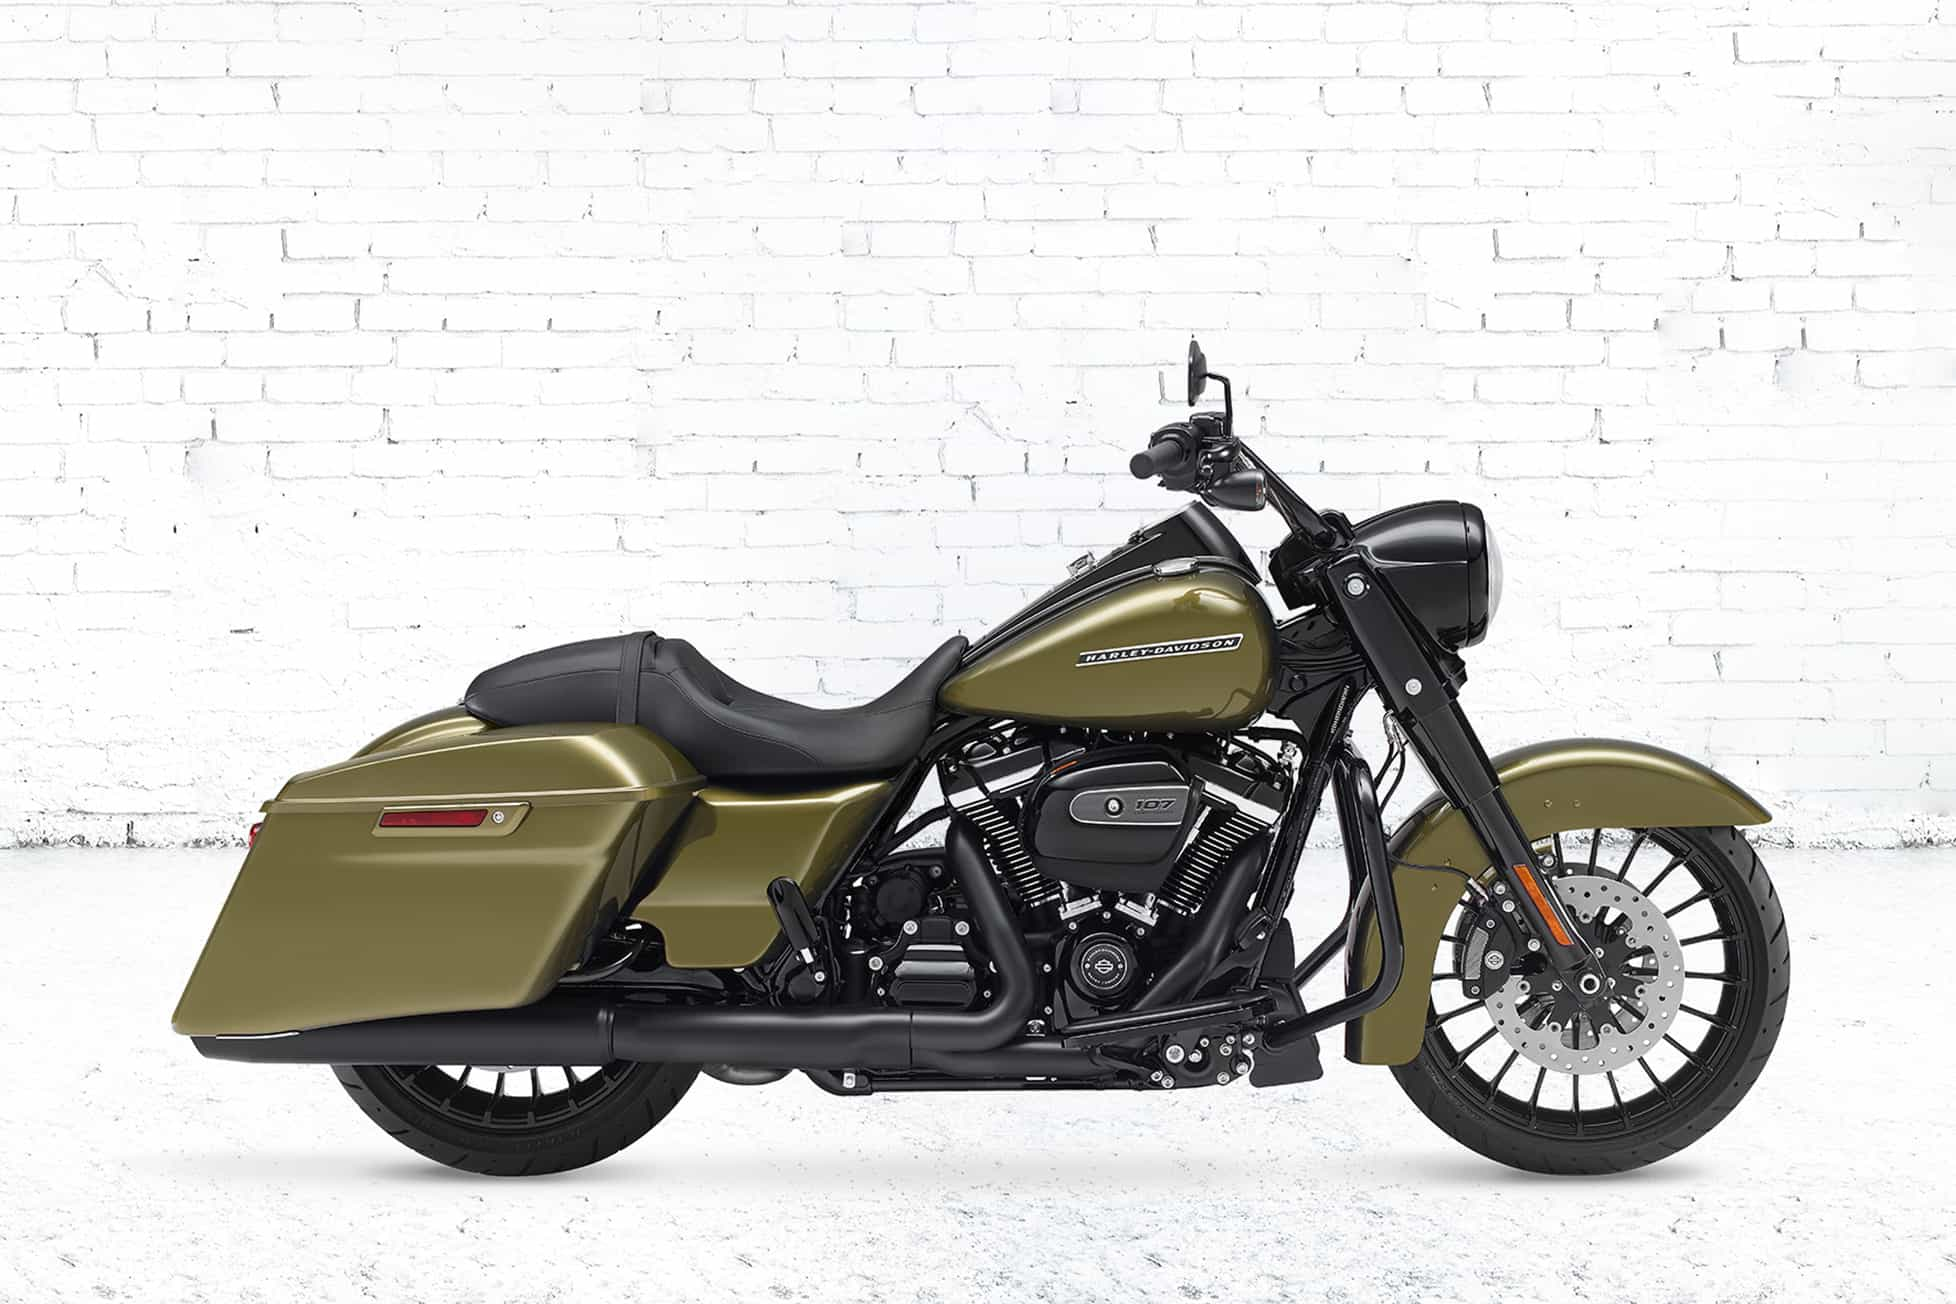 Harley Davidson Road King Engine Diagram Wiring Diagrams Schematic Police Harness 2018 Harleydavidson Special At